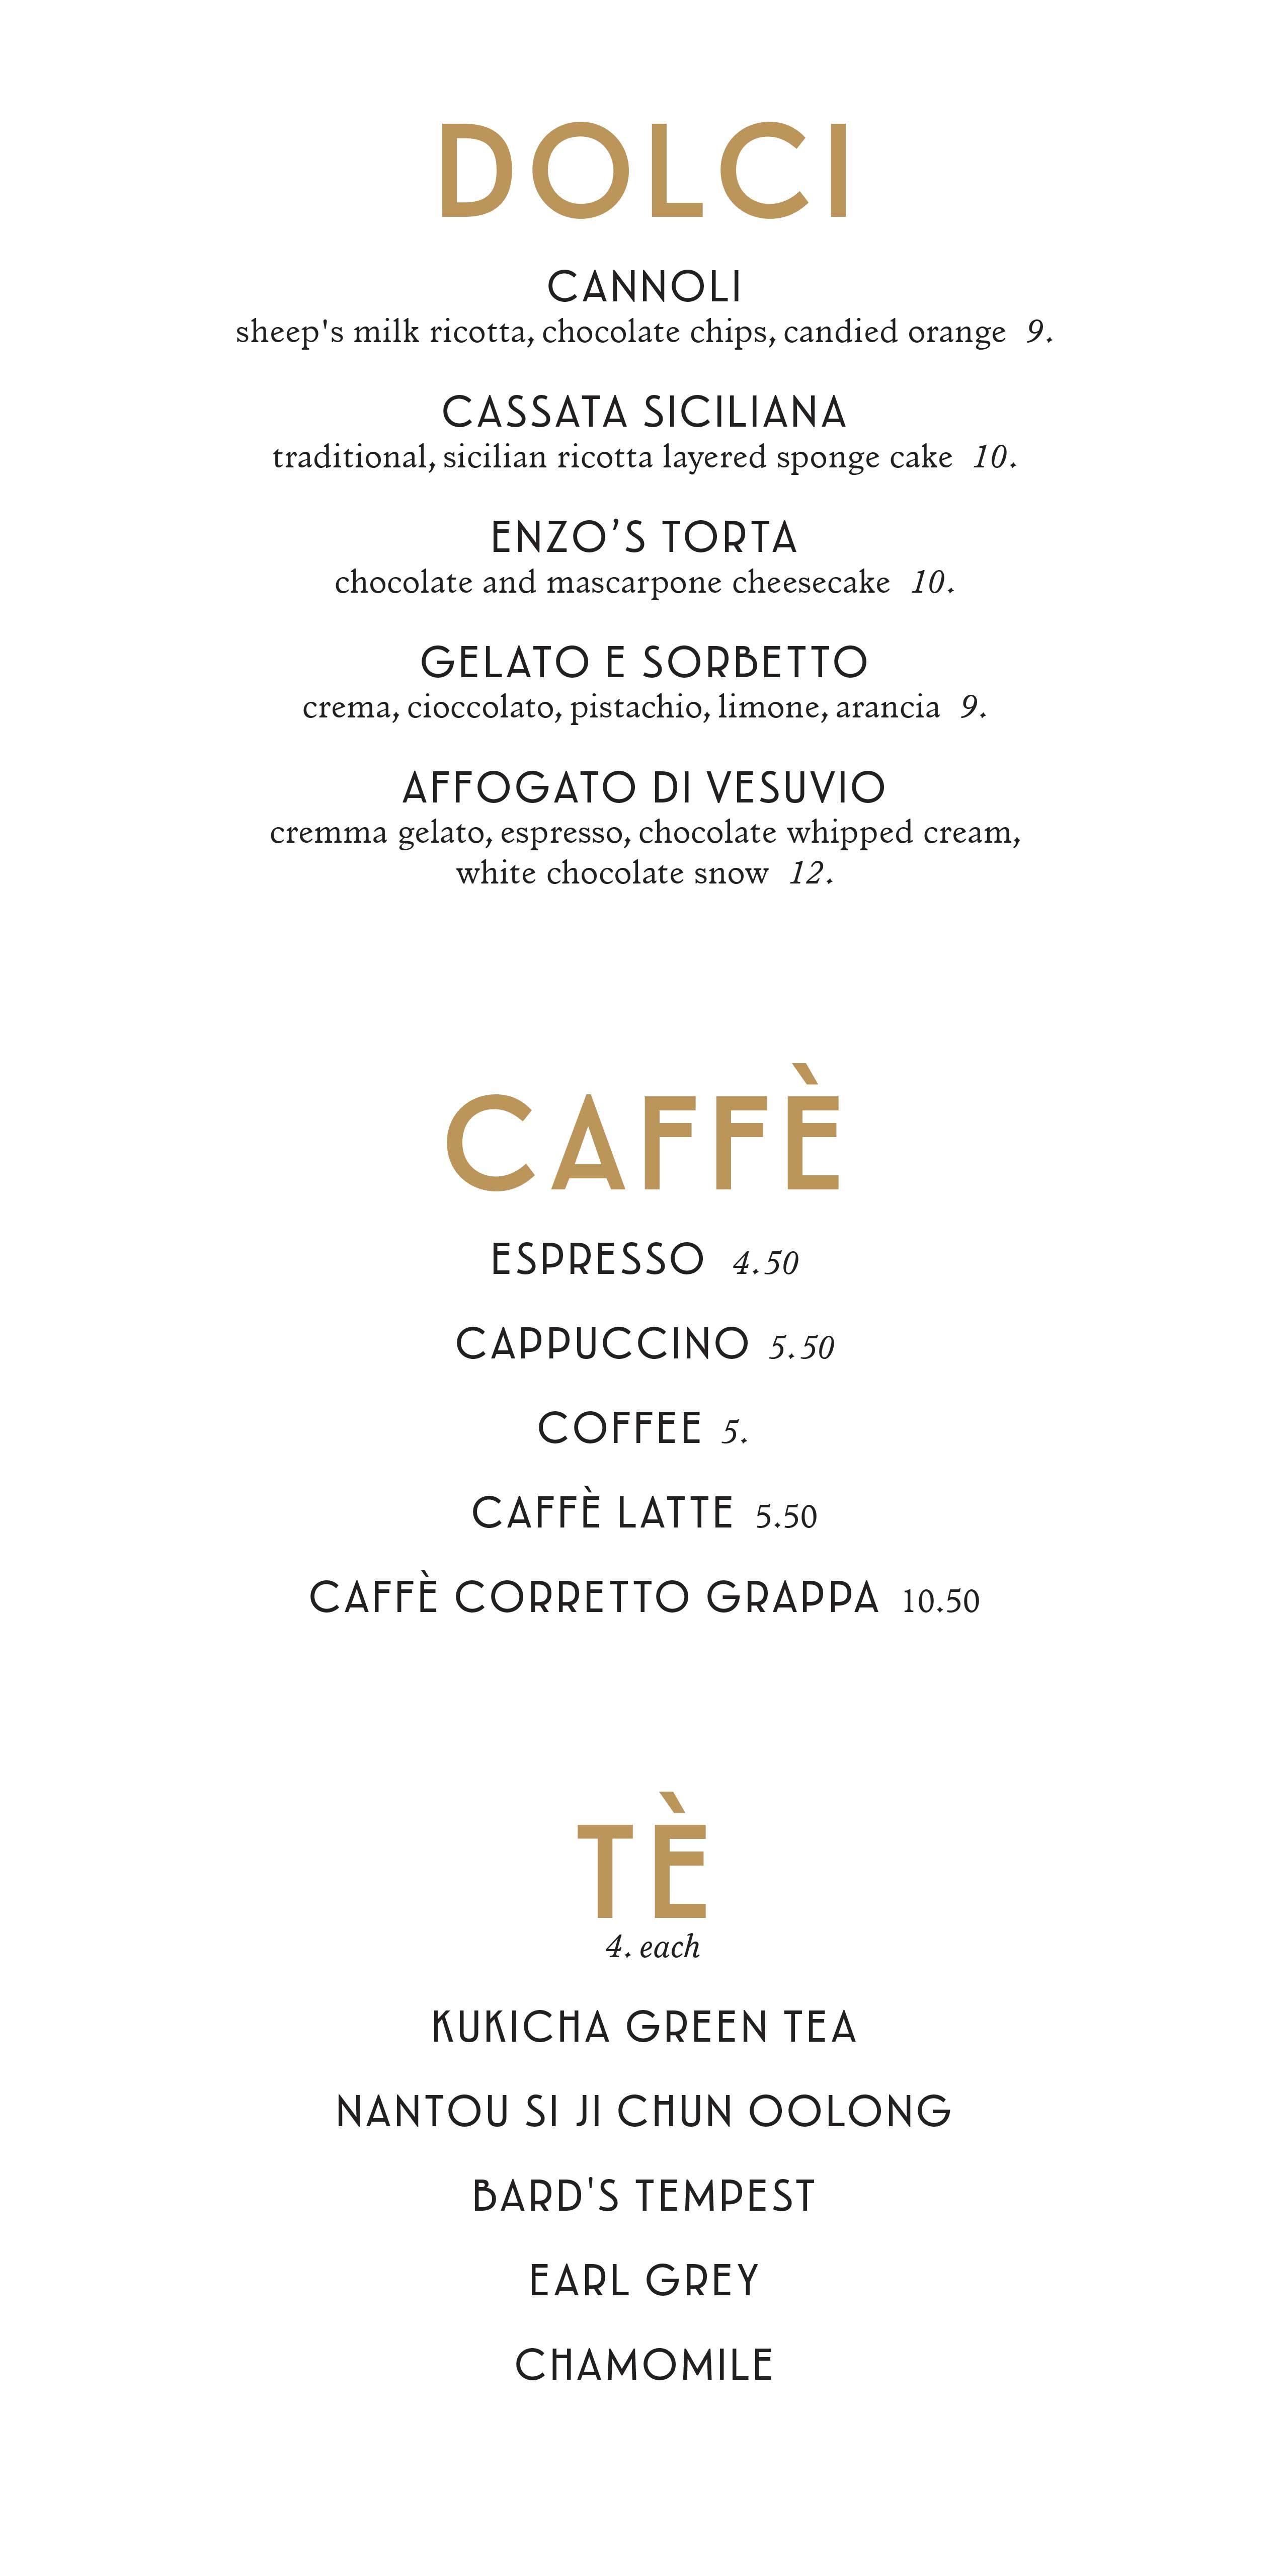 Maria & Enzo's menus - July 2019